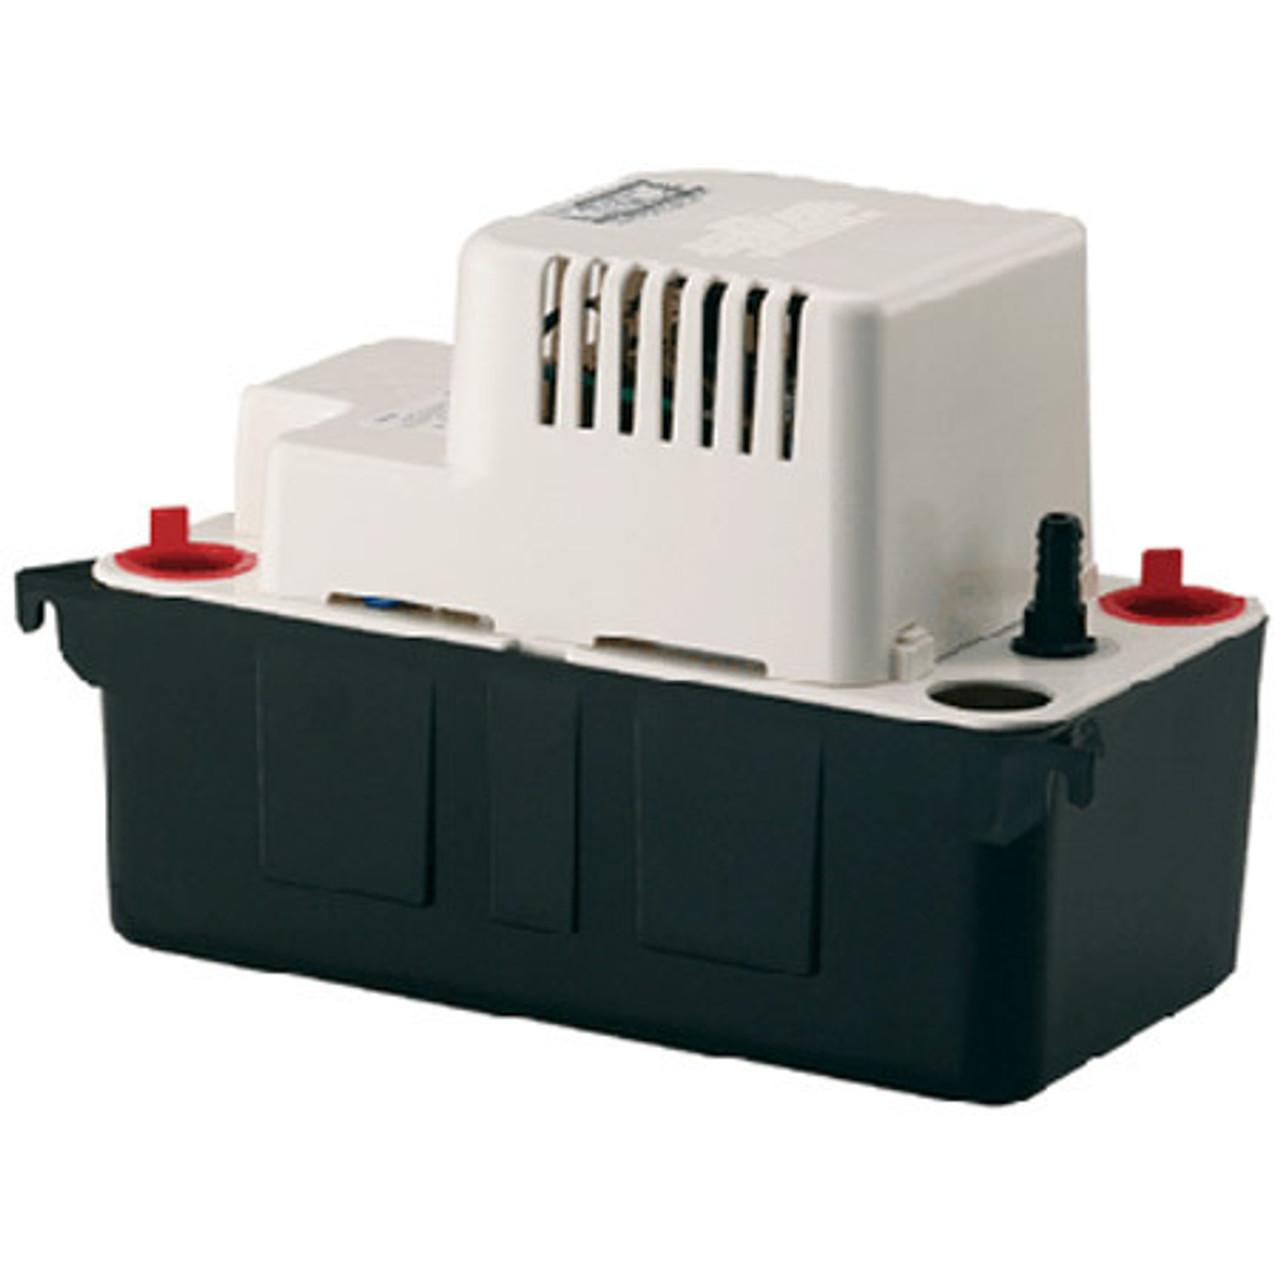 A/C Condensate Pumps